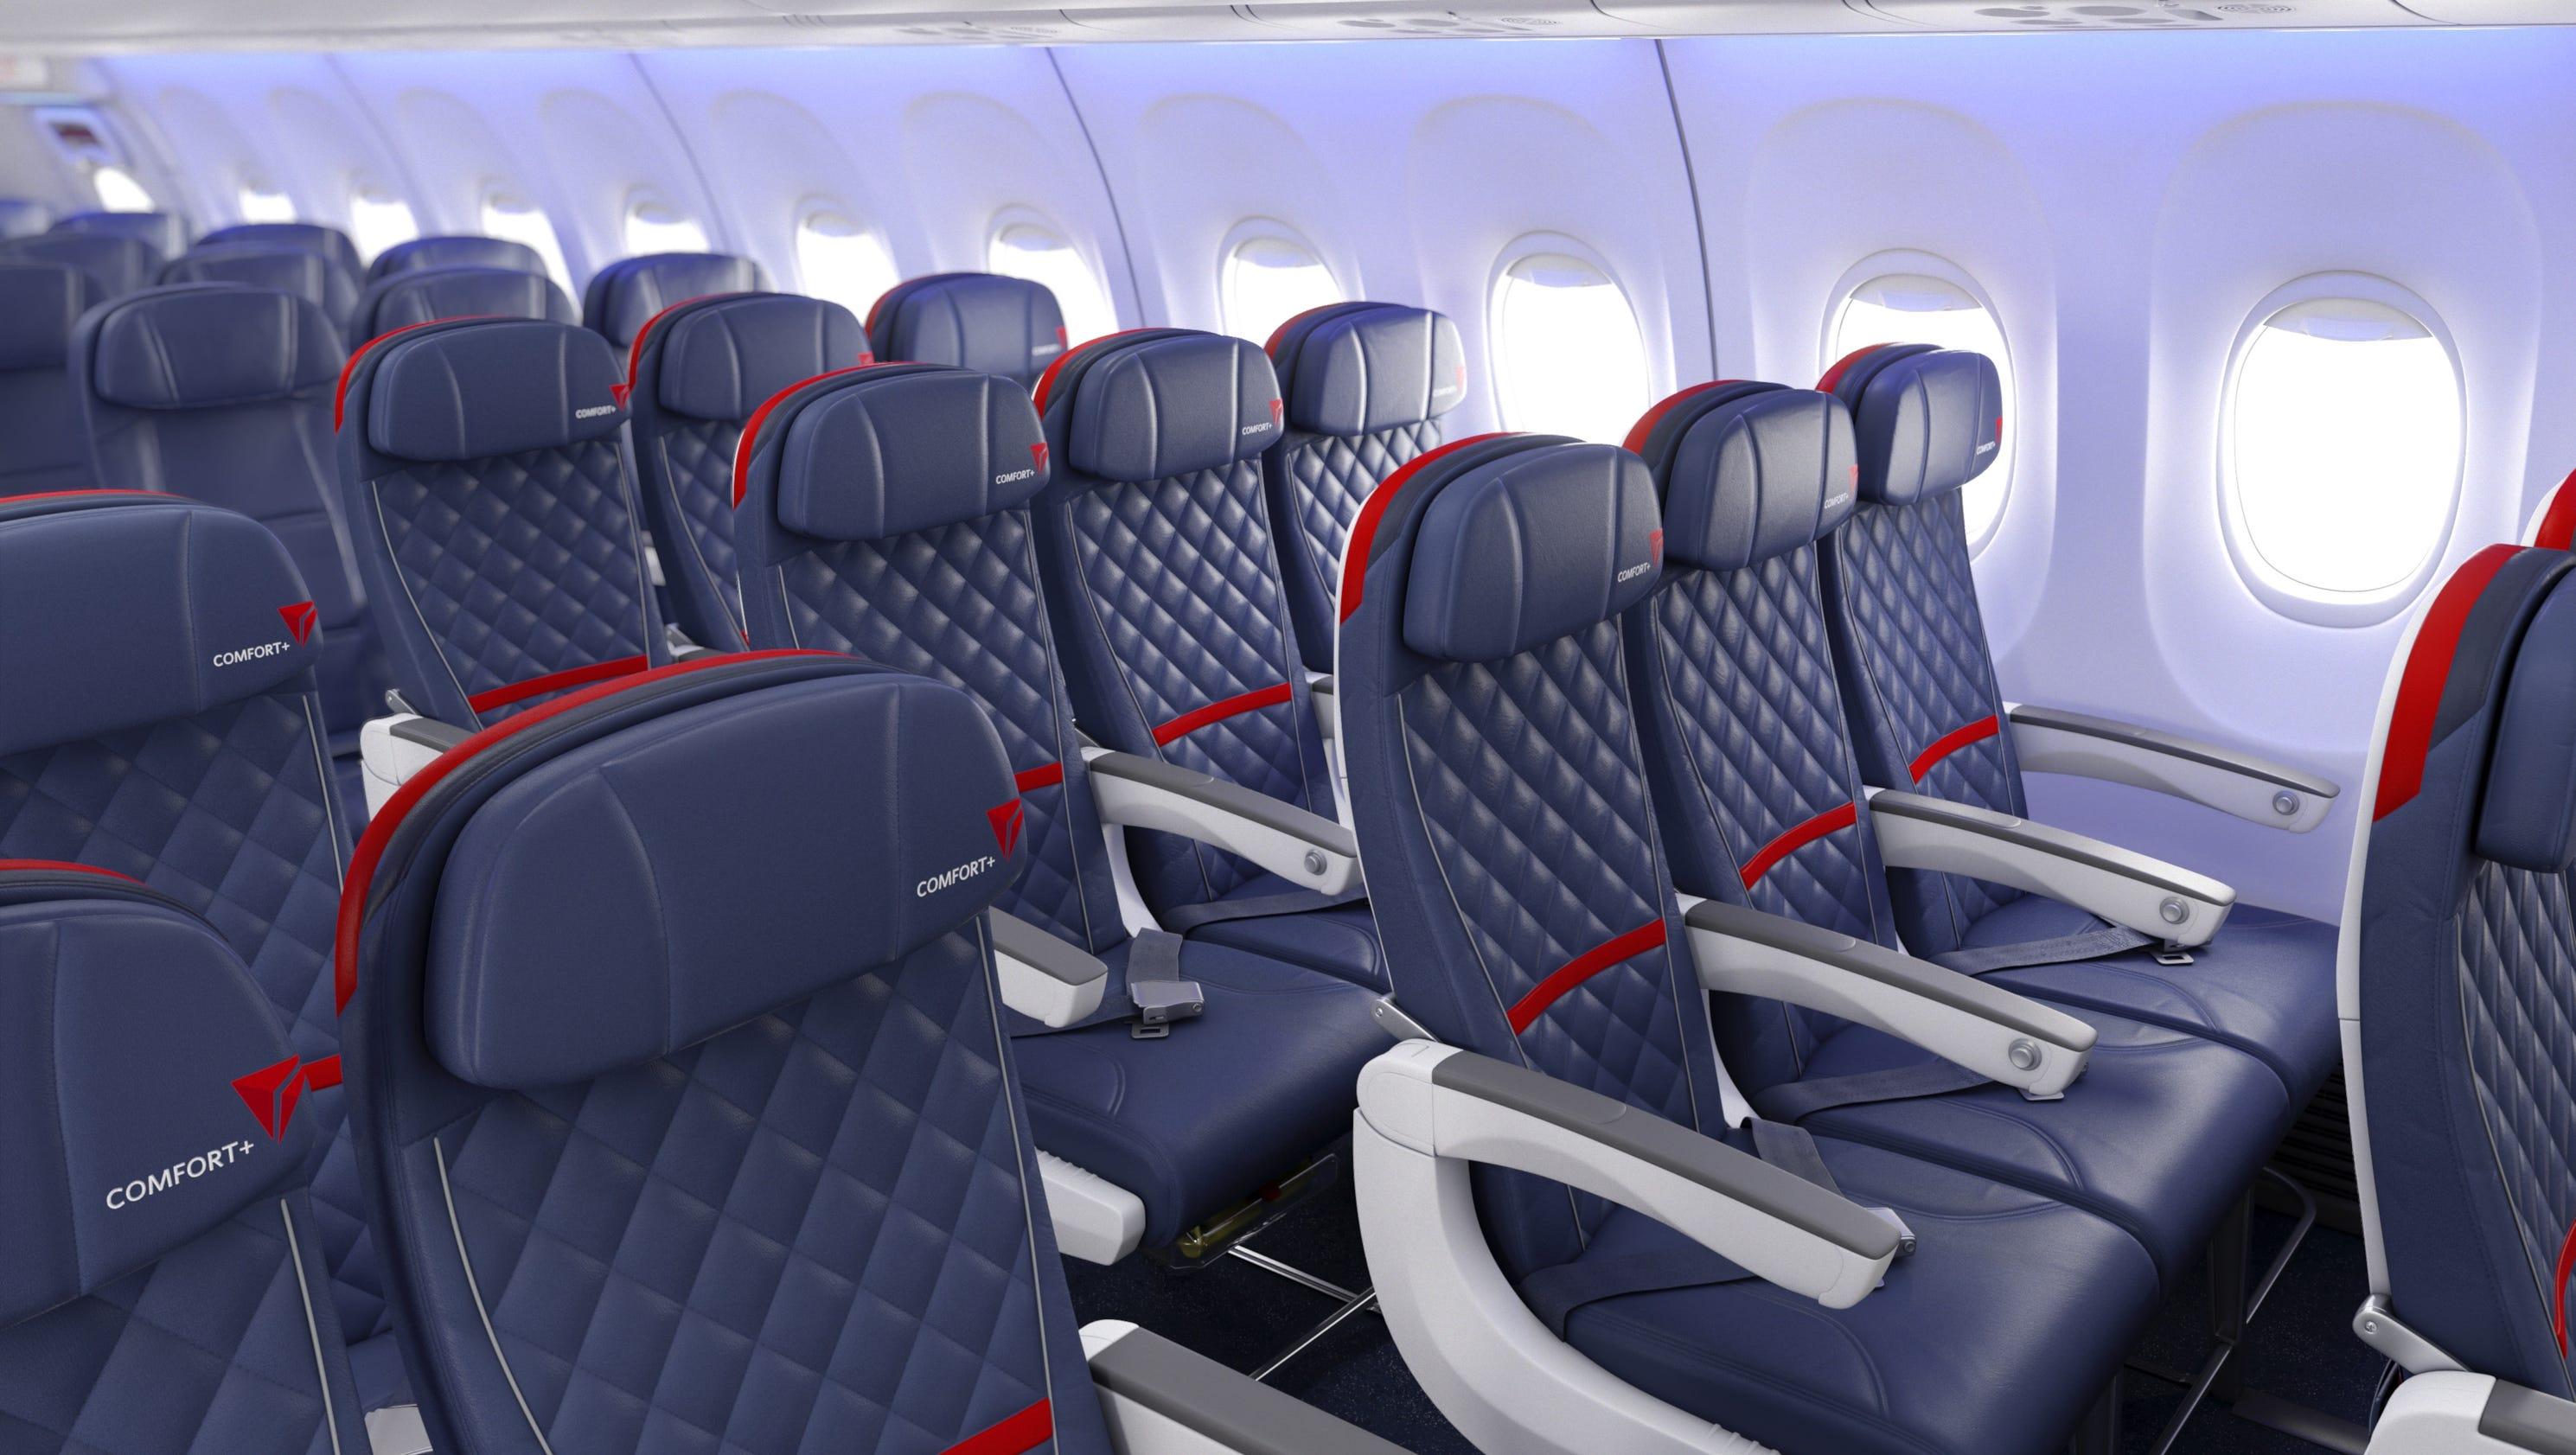 Delta Air Lines Rebrands Its Seating Options